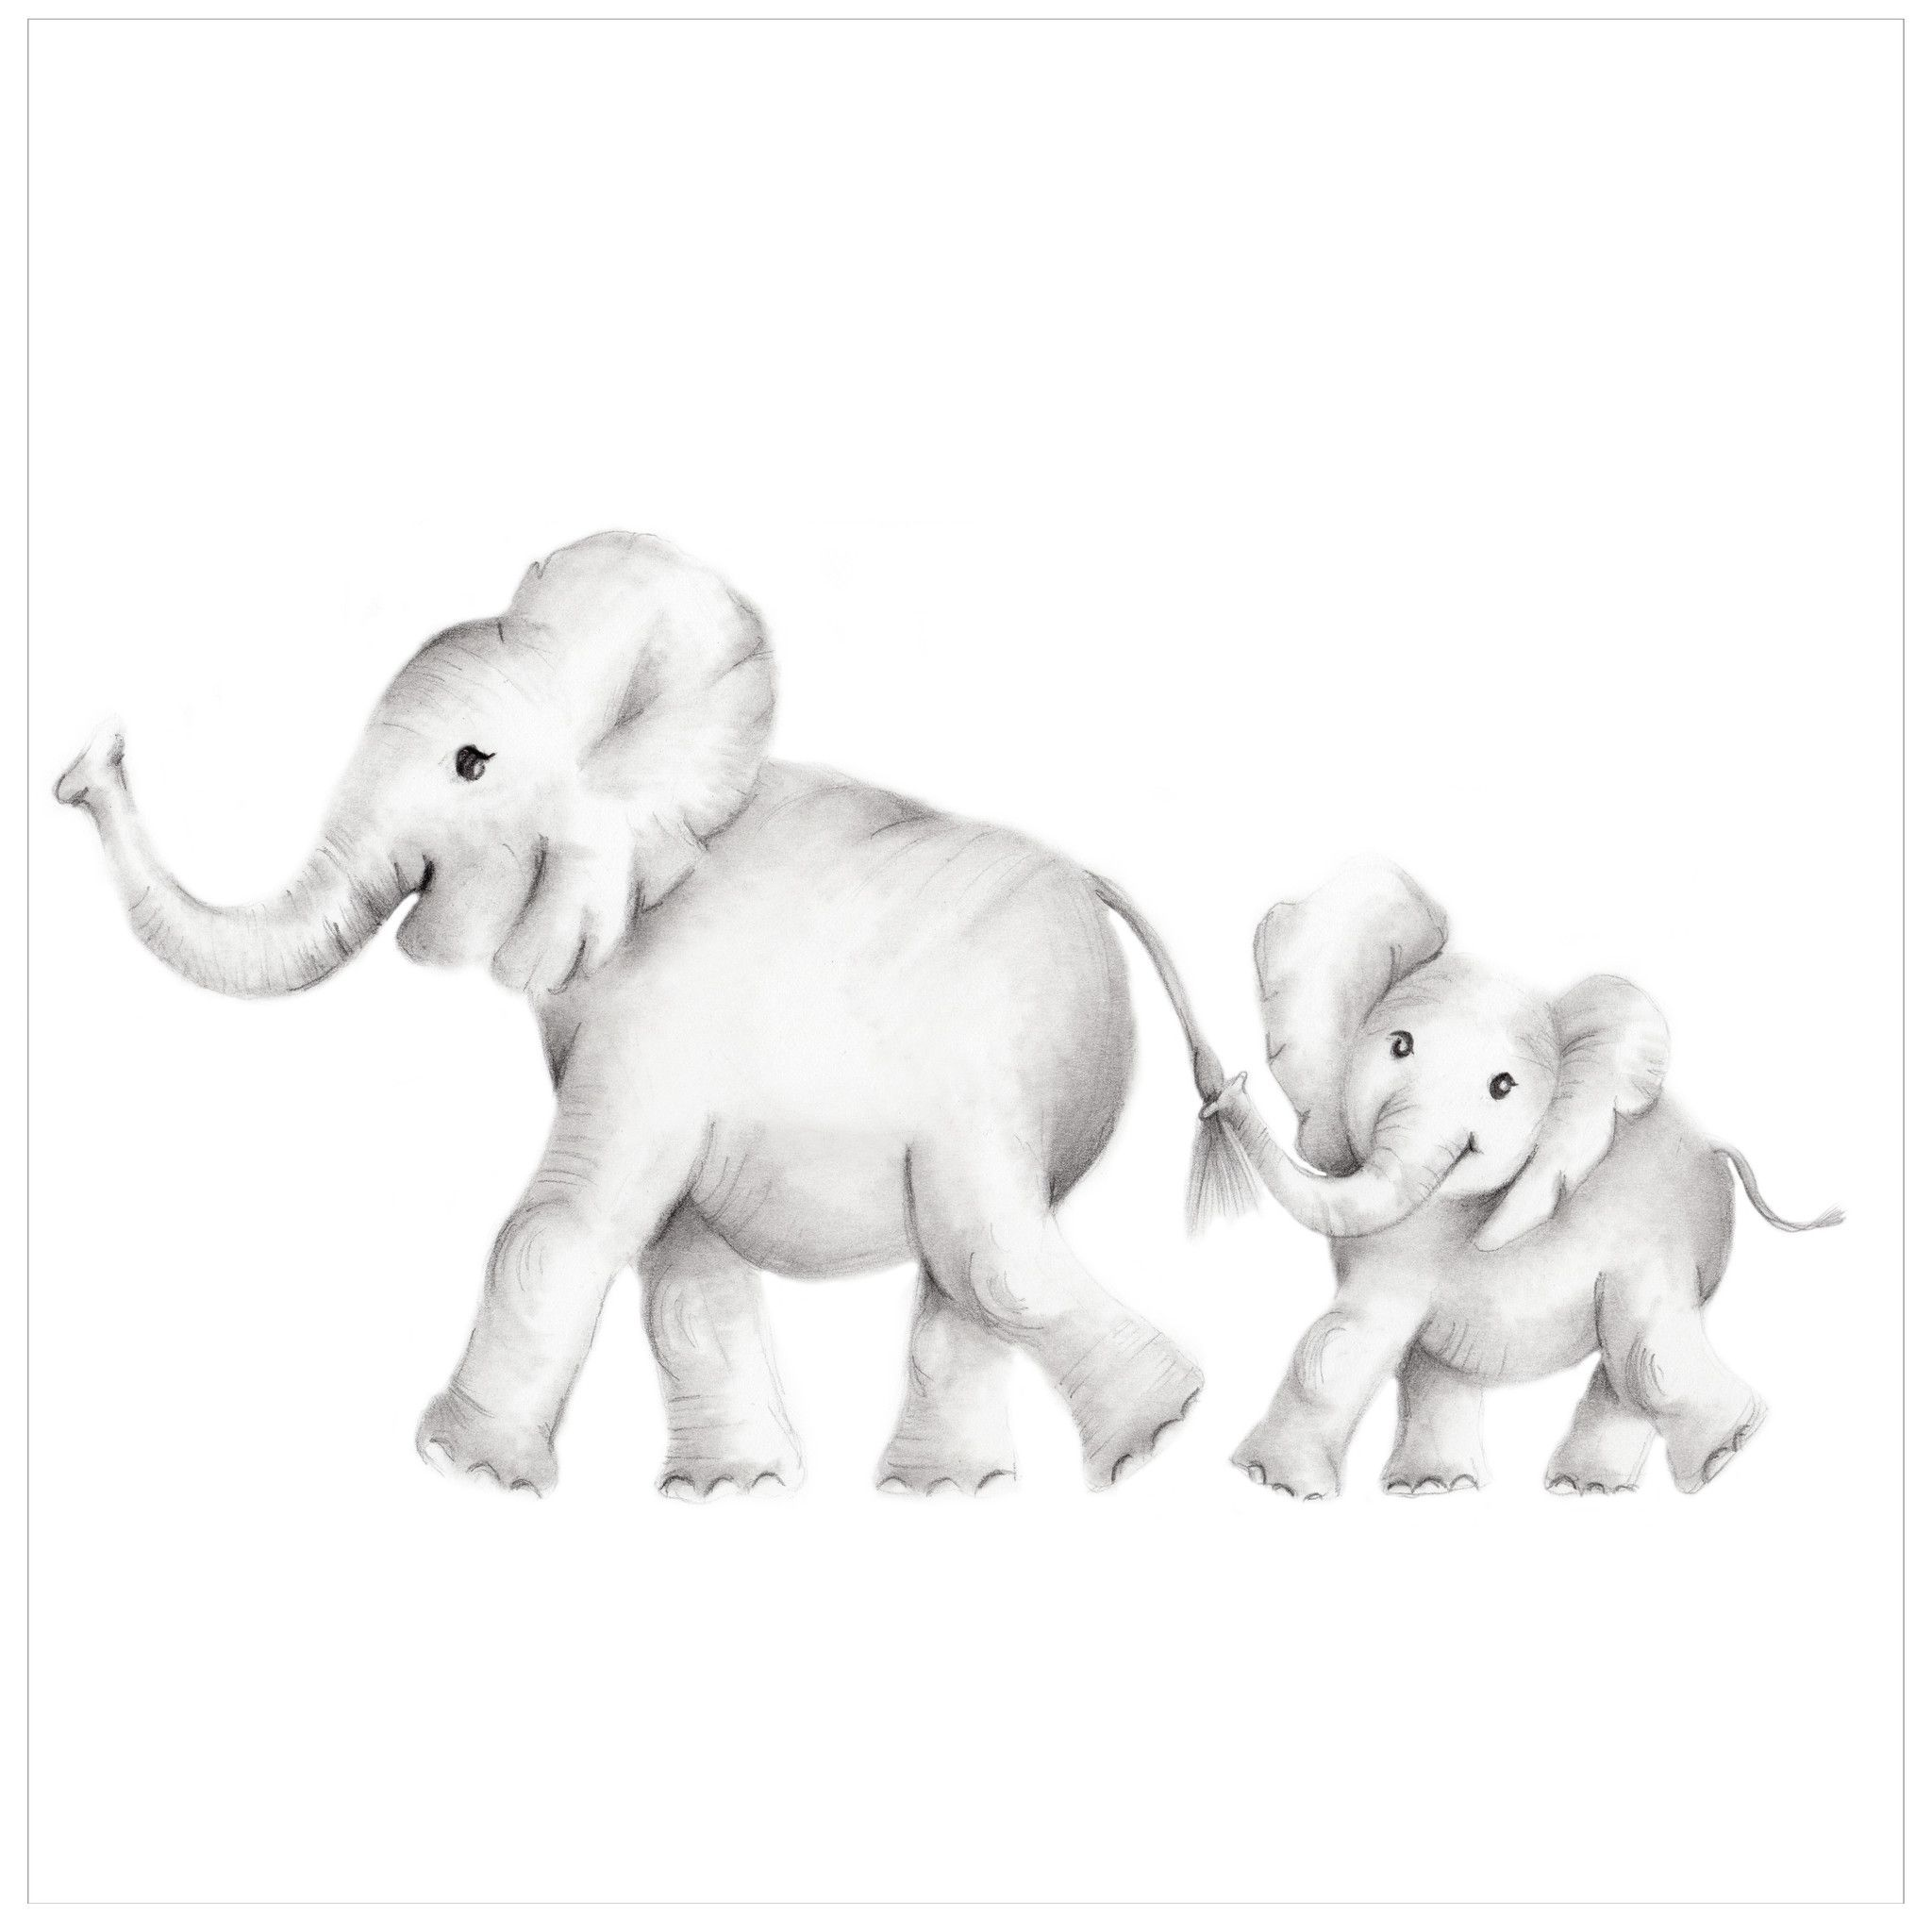 Elephant Family Print Welcome New Baby Love heart Safari | Etsy | Safari  animal prints, Safari animal prints nursery, Elephant family drawing